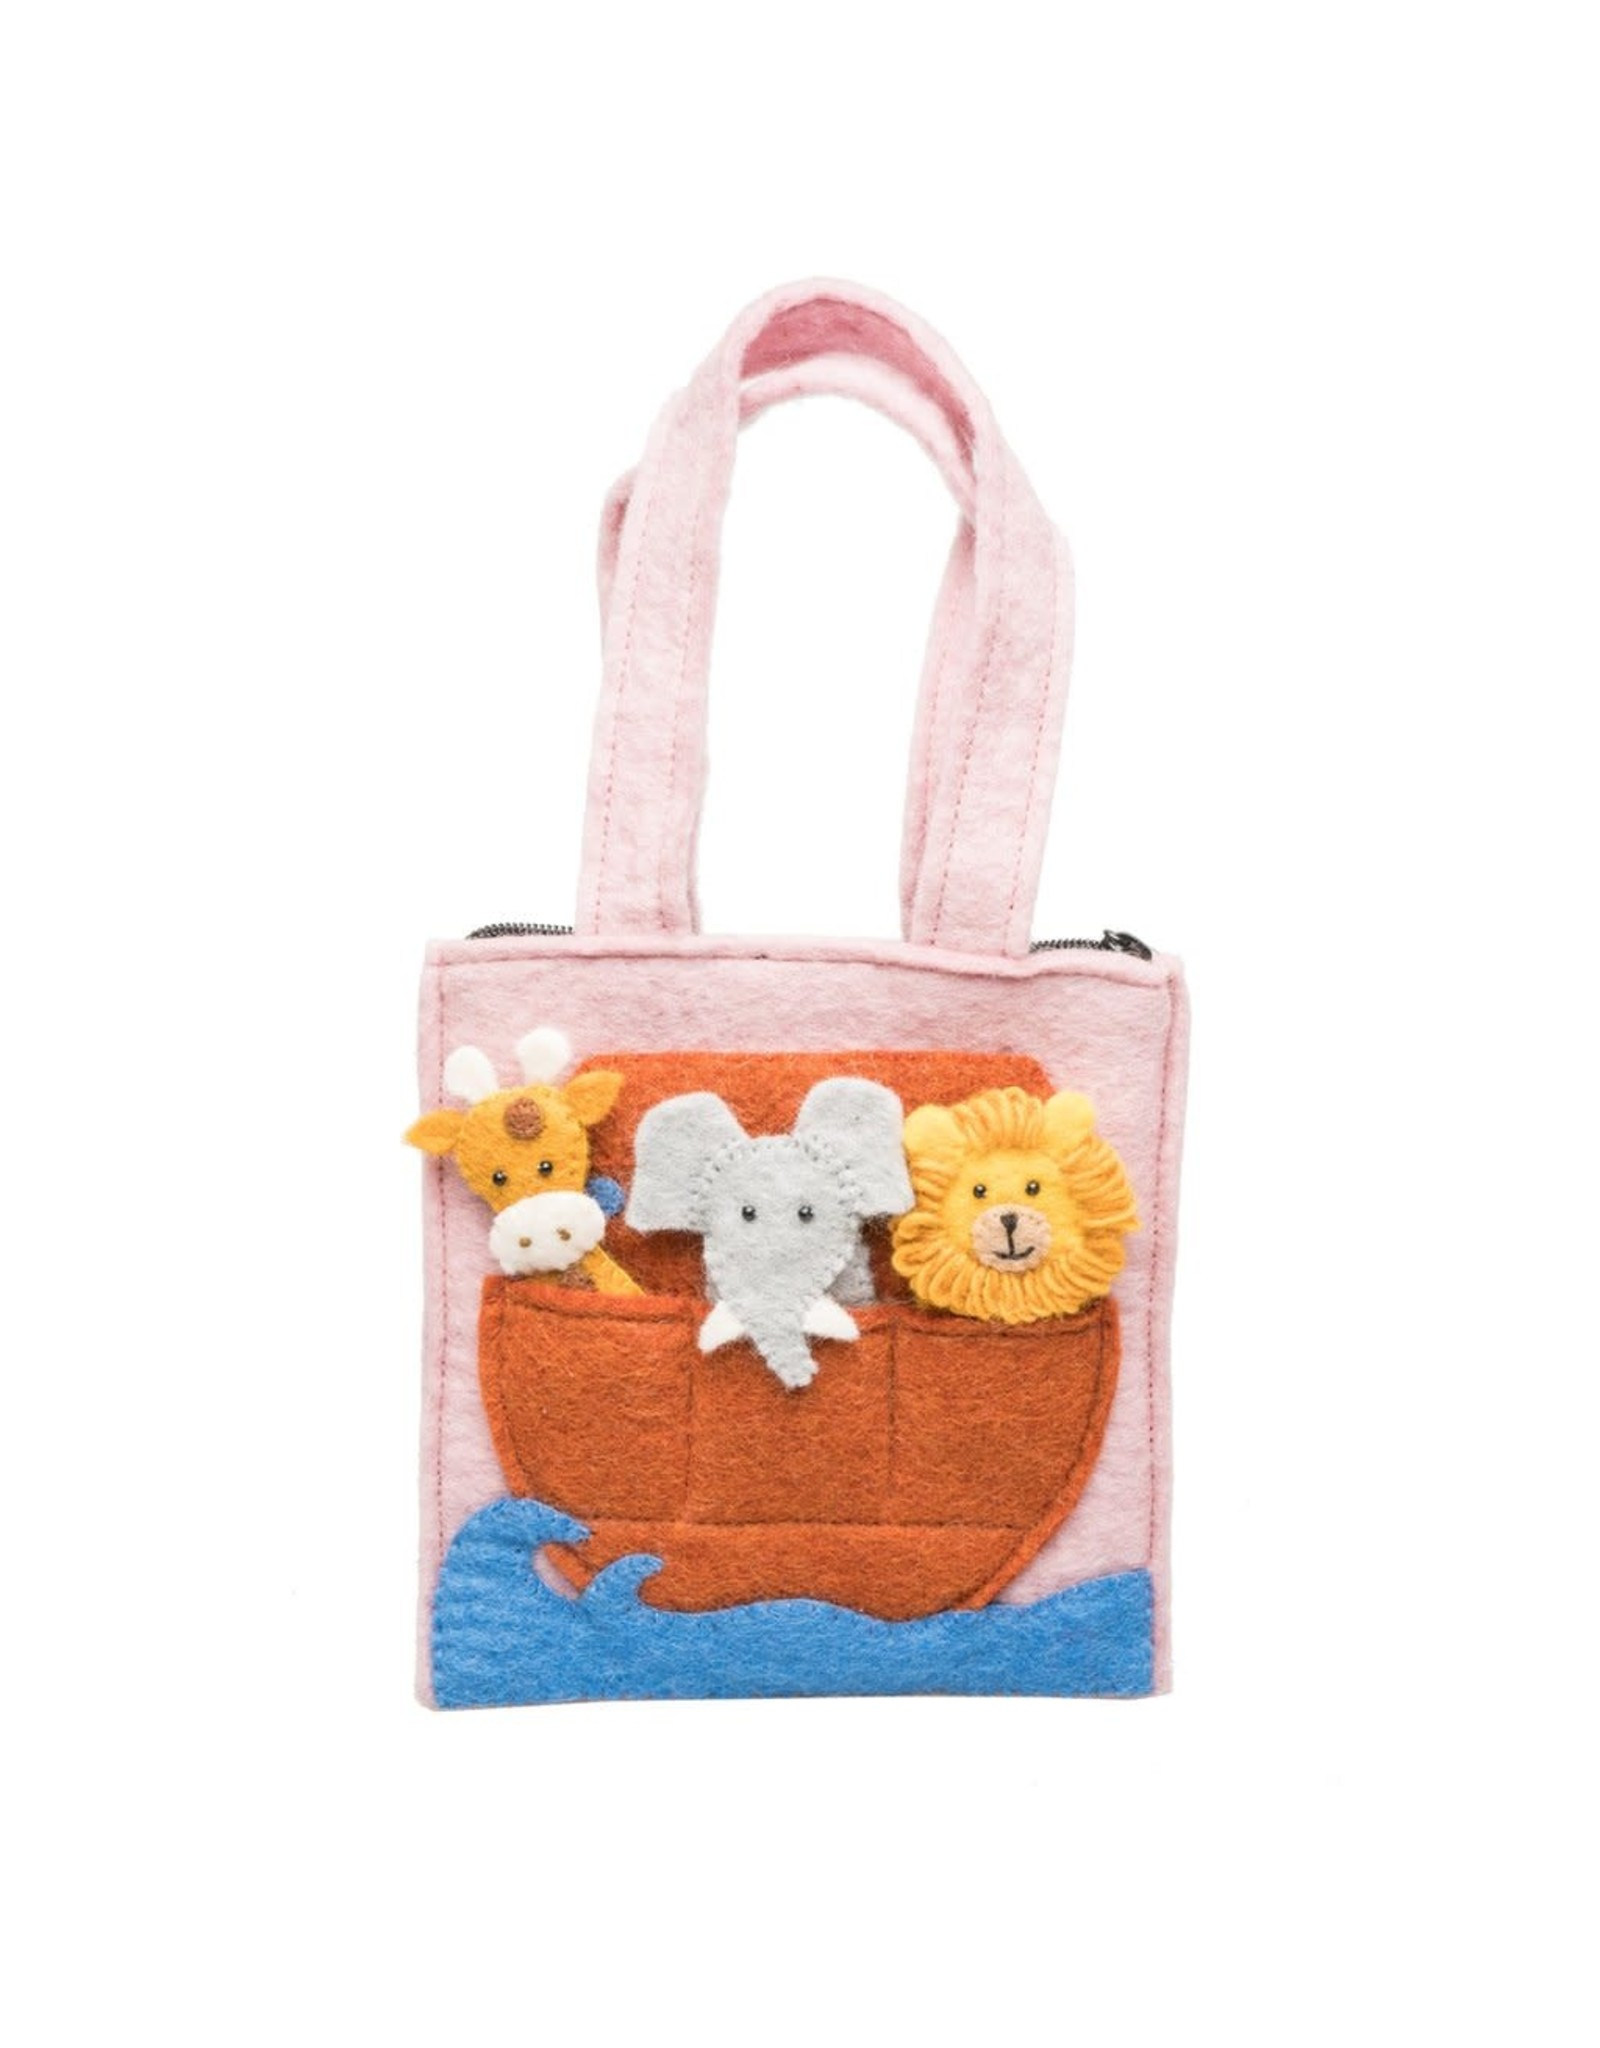 Felt Noah's Ark  Finger Puppets Bag, Nepal